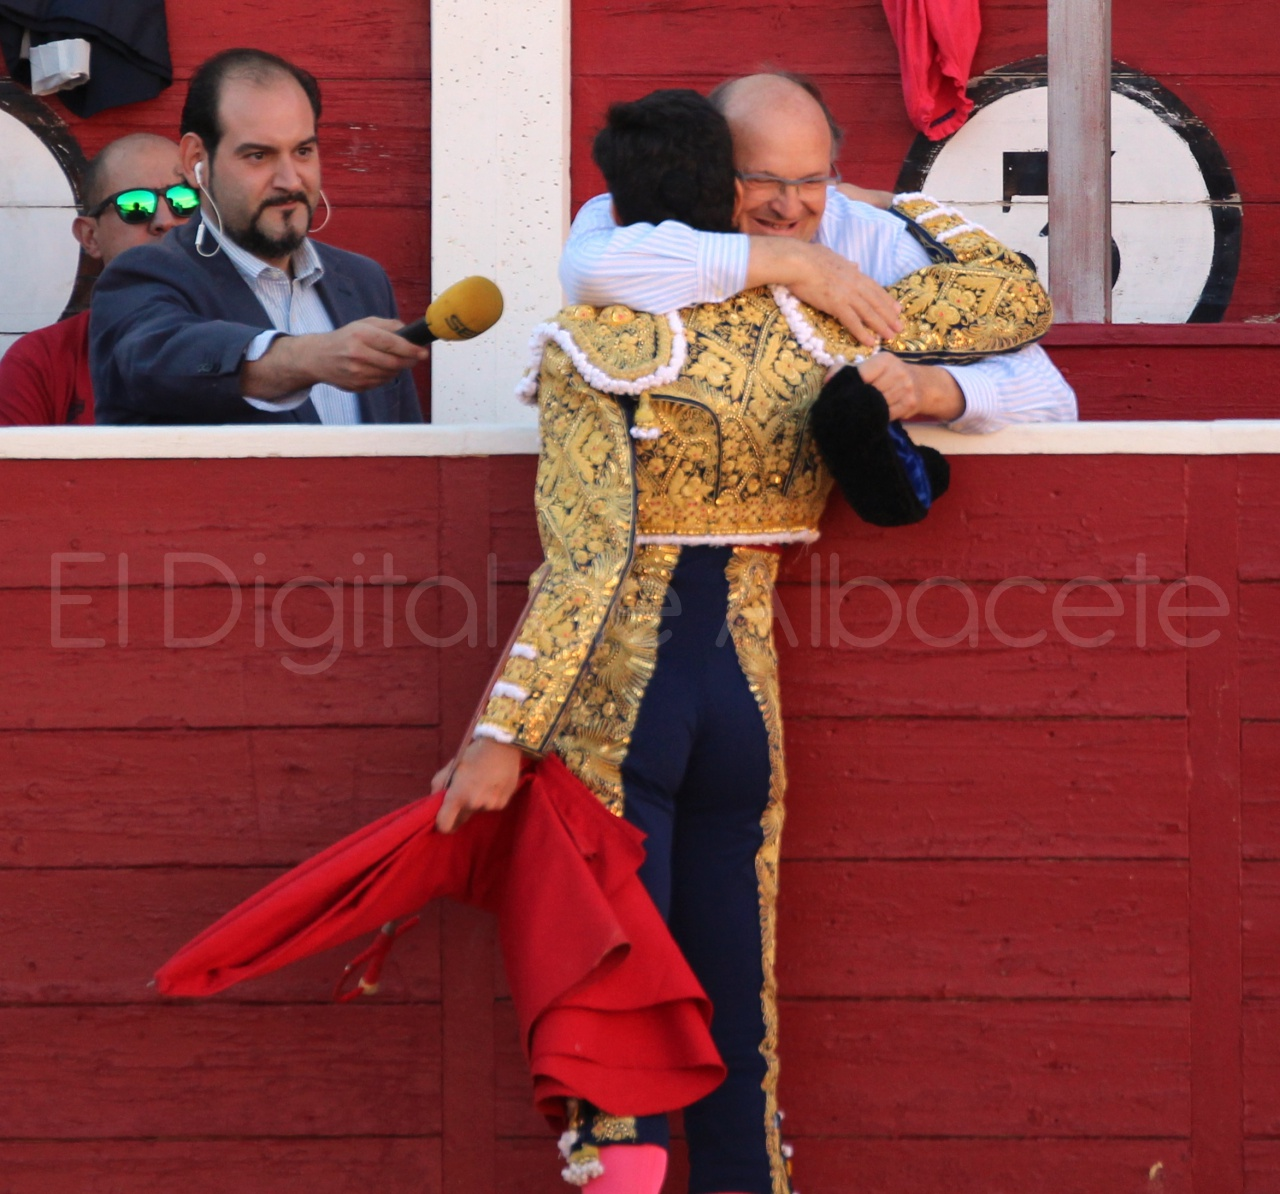 El Juli Lopez Simon y Garrido Feria Albacete 2015 toros  29